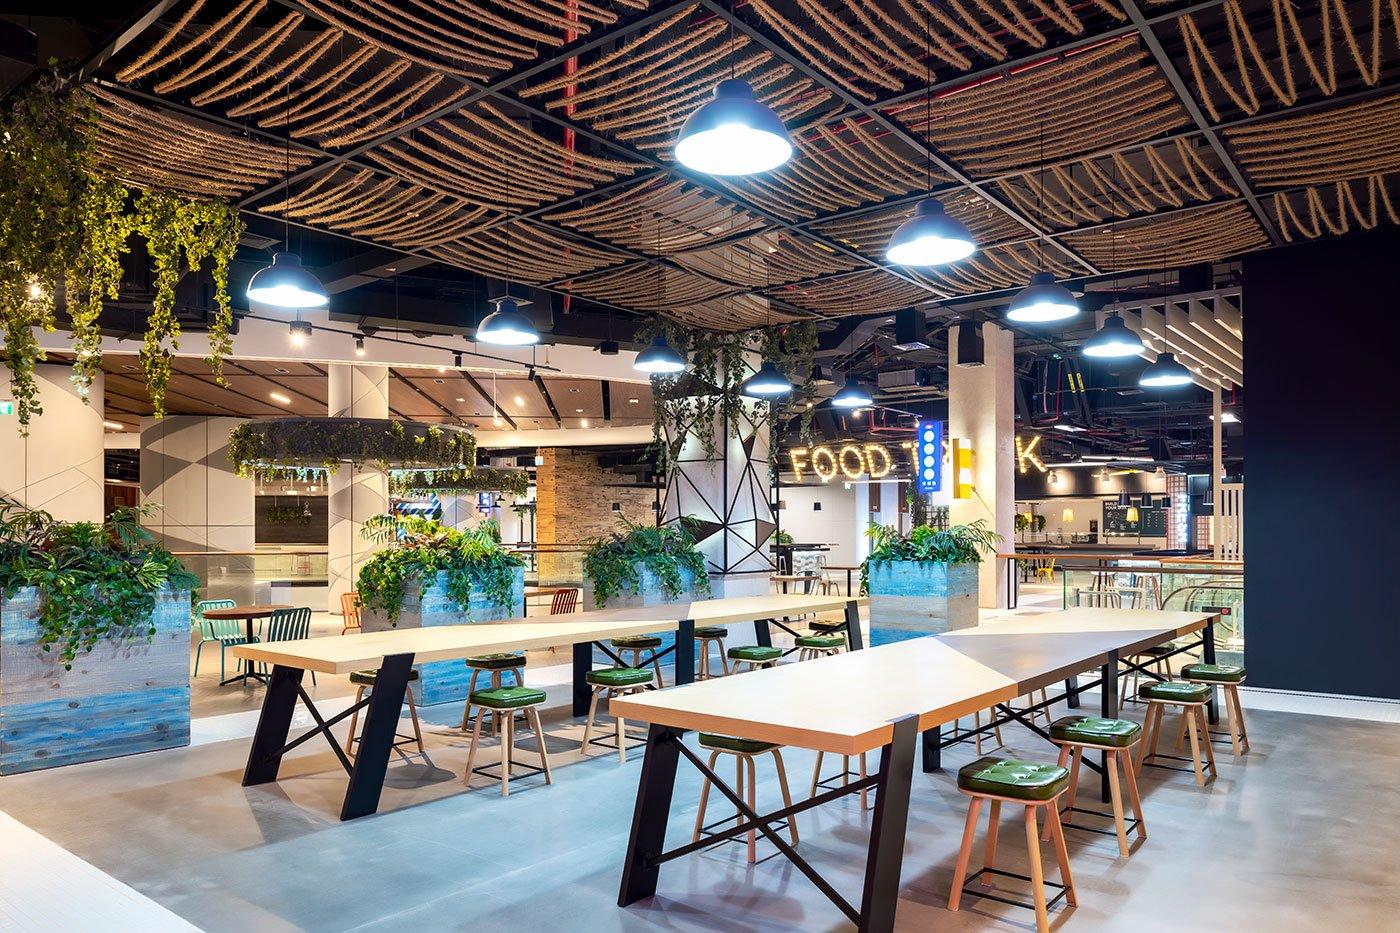 food court photographer